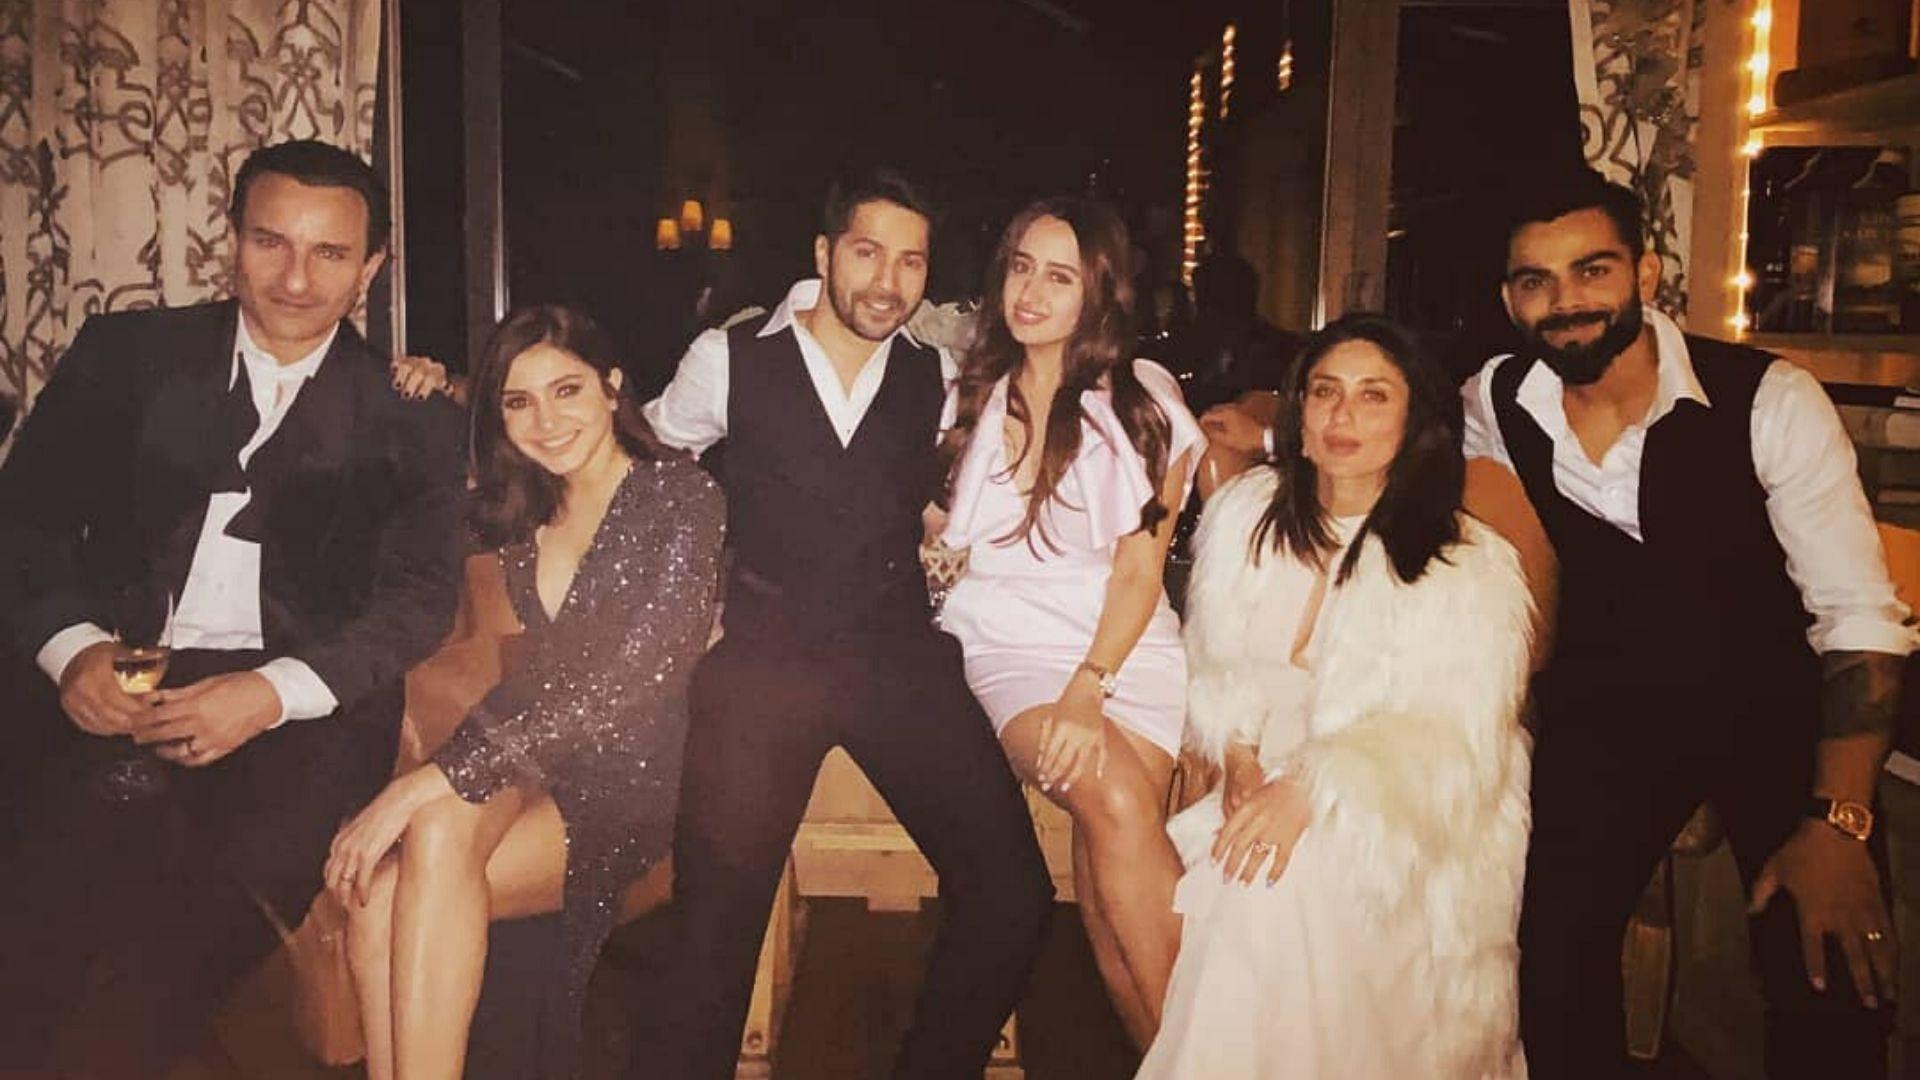 The couple rang in the New Year with Anushka Sharma and Virat Kohli and Kareena Kapoor Khan and Saif Ali Khan in Switzerland